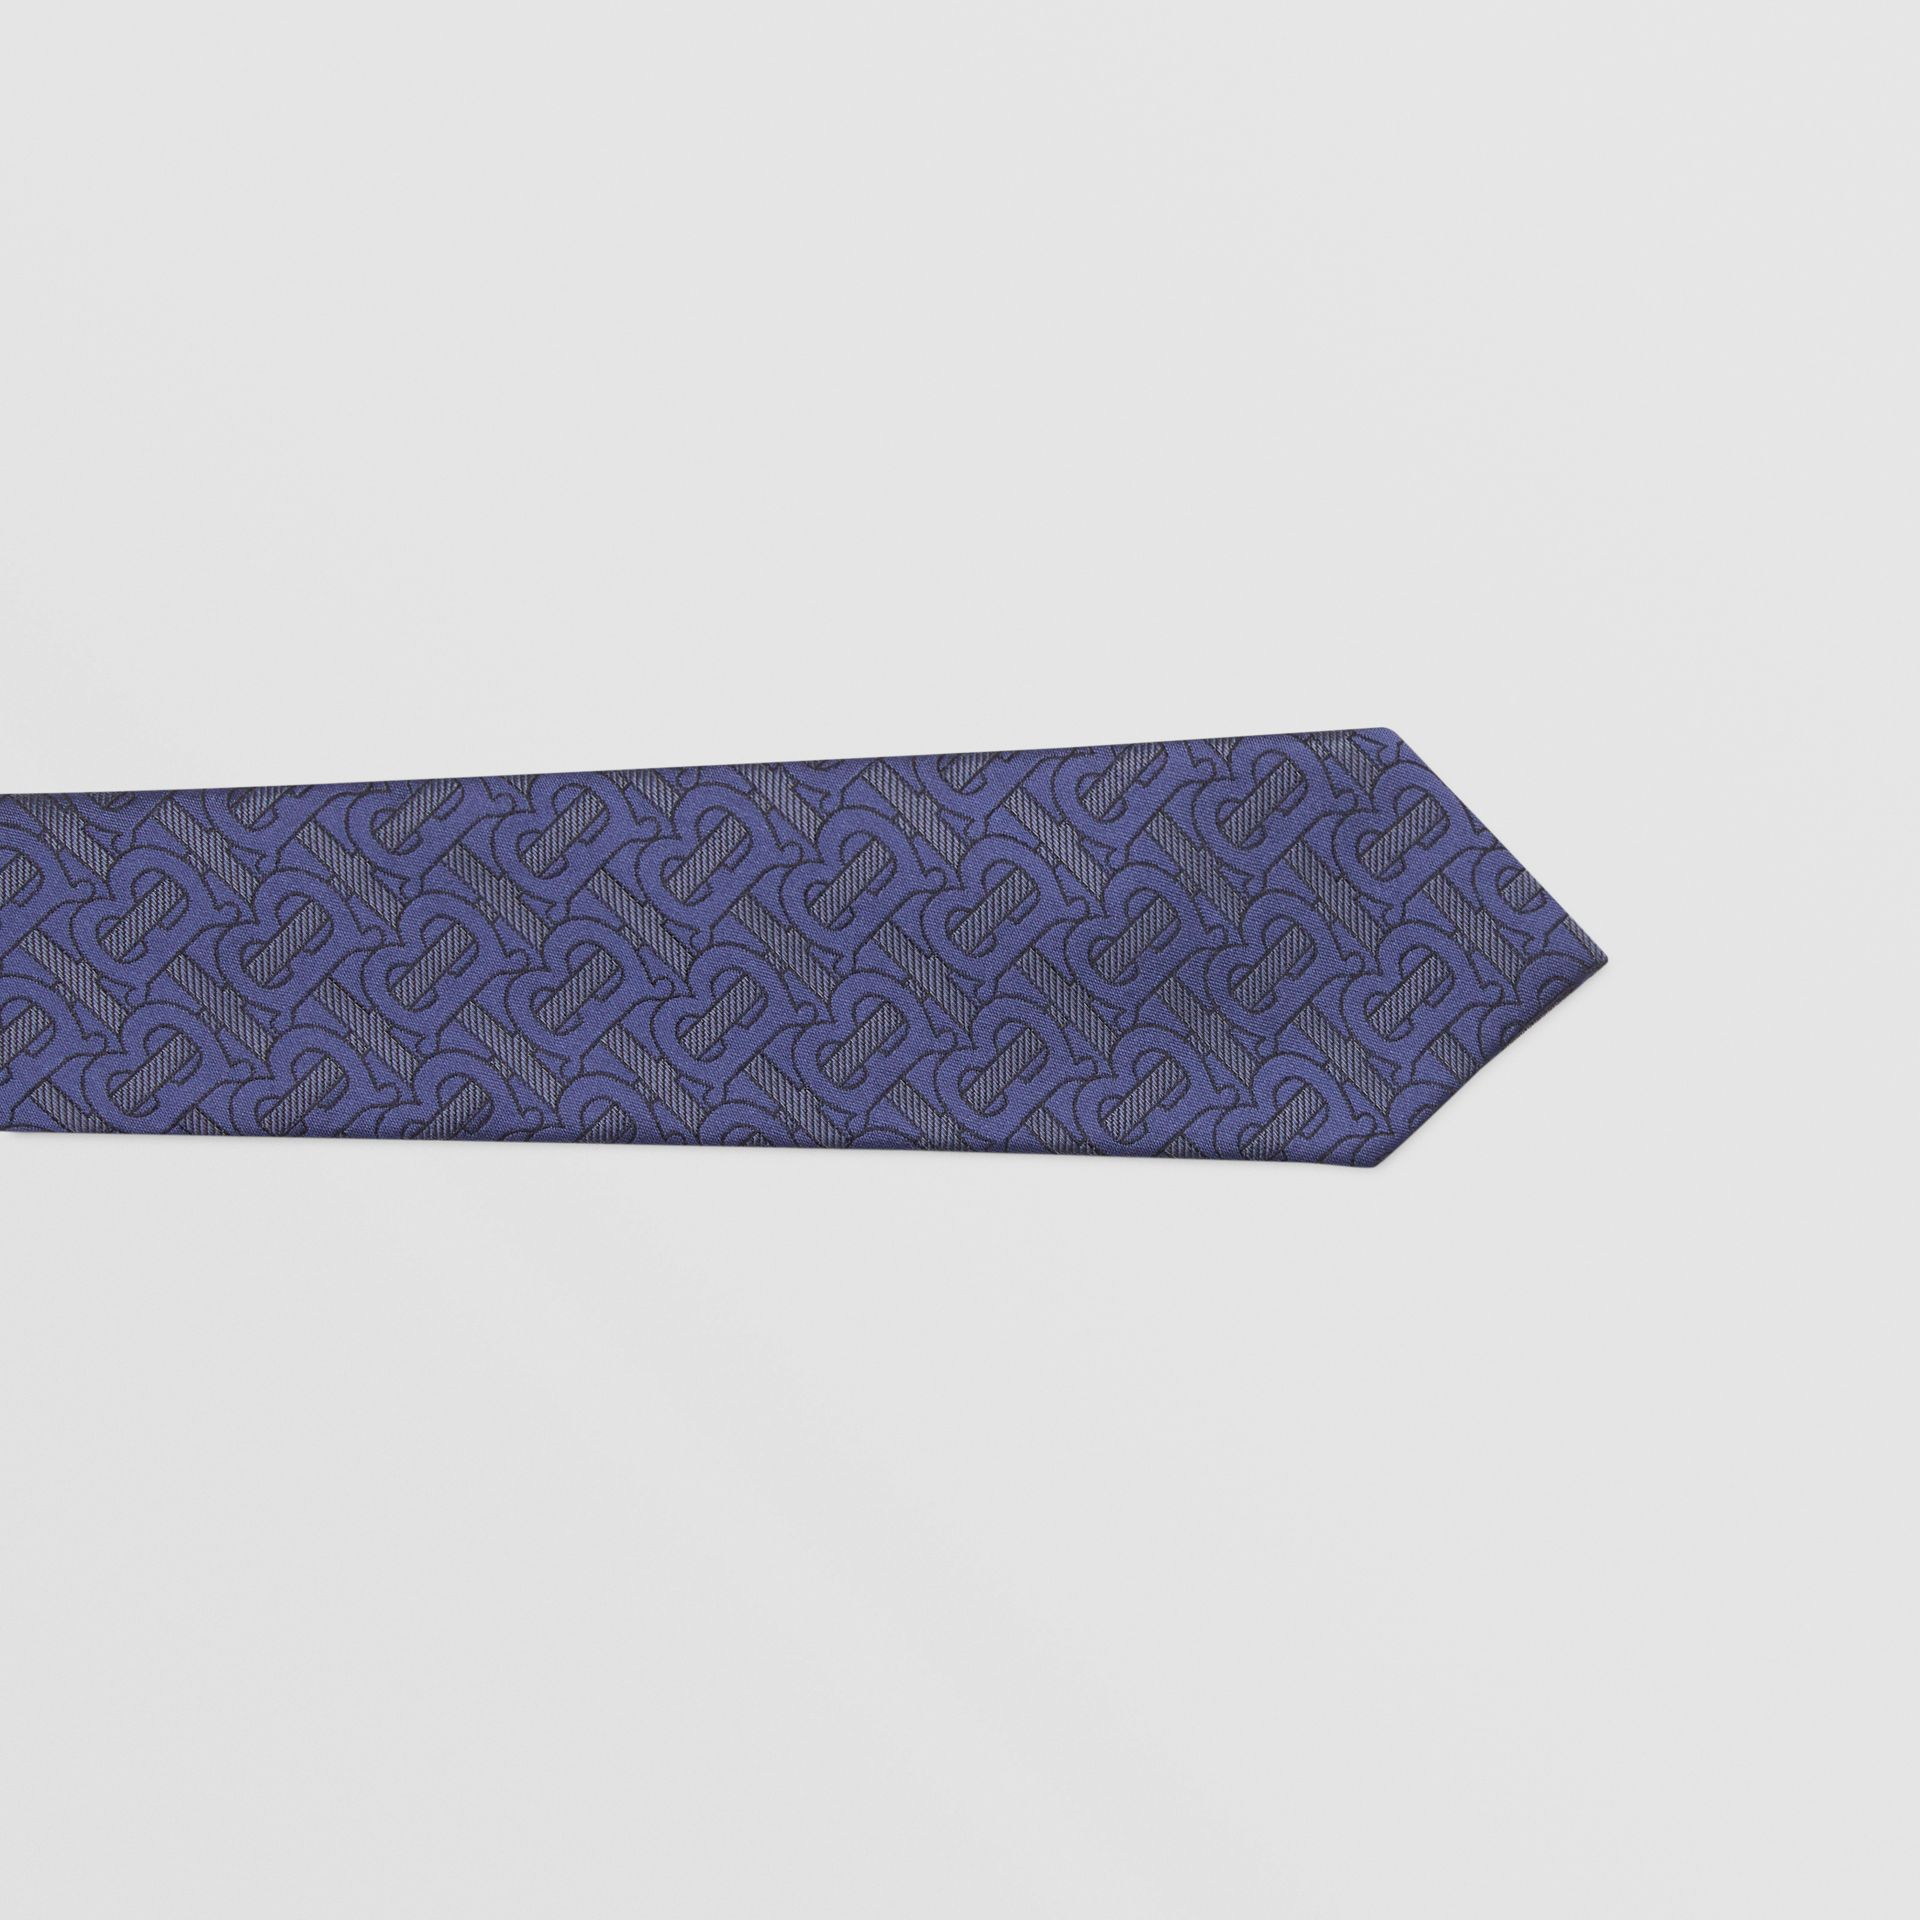 Classic Cut Monogram Silk Blend Jacquard Tie in Bright Indigo - Men | Burberry Hong Kong S.A.R - gallery image 1